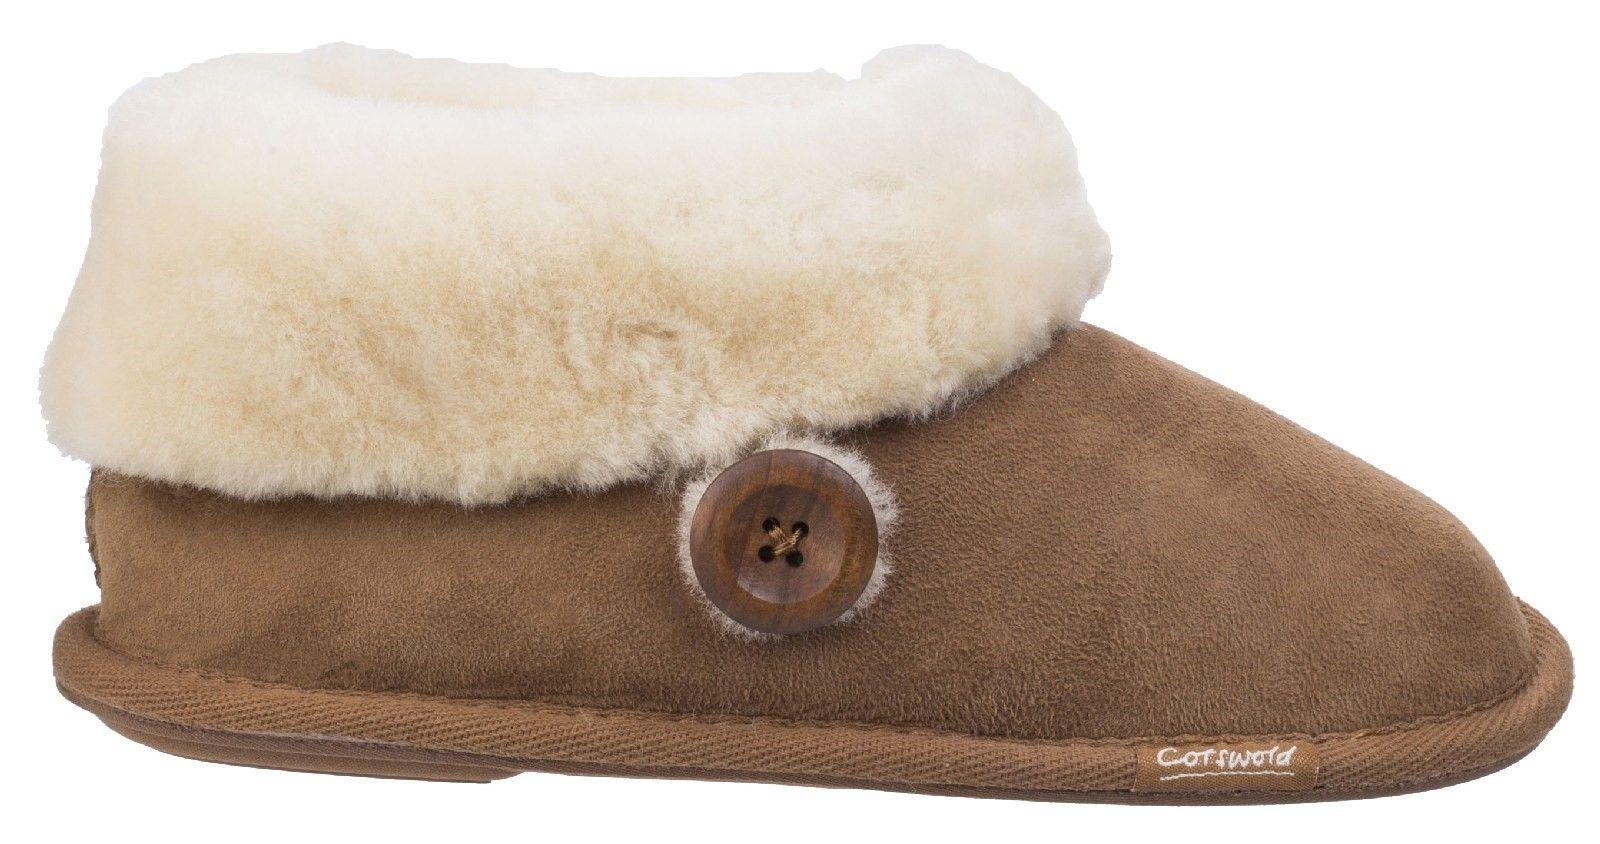 Wotton Sheepskin Bootie